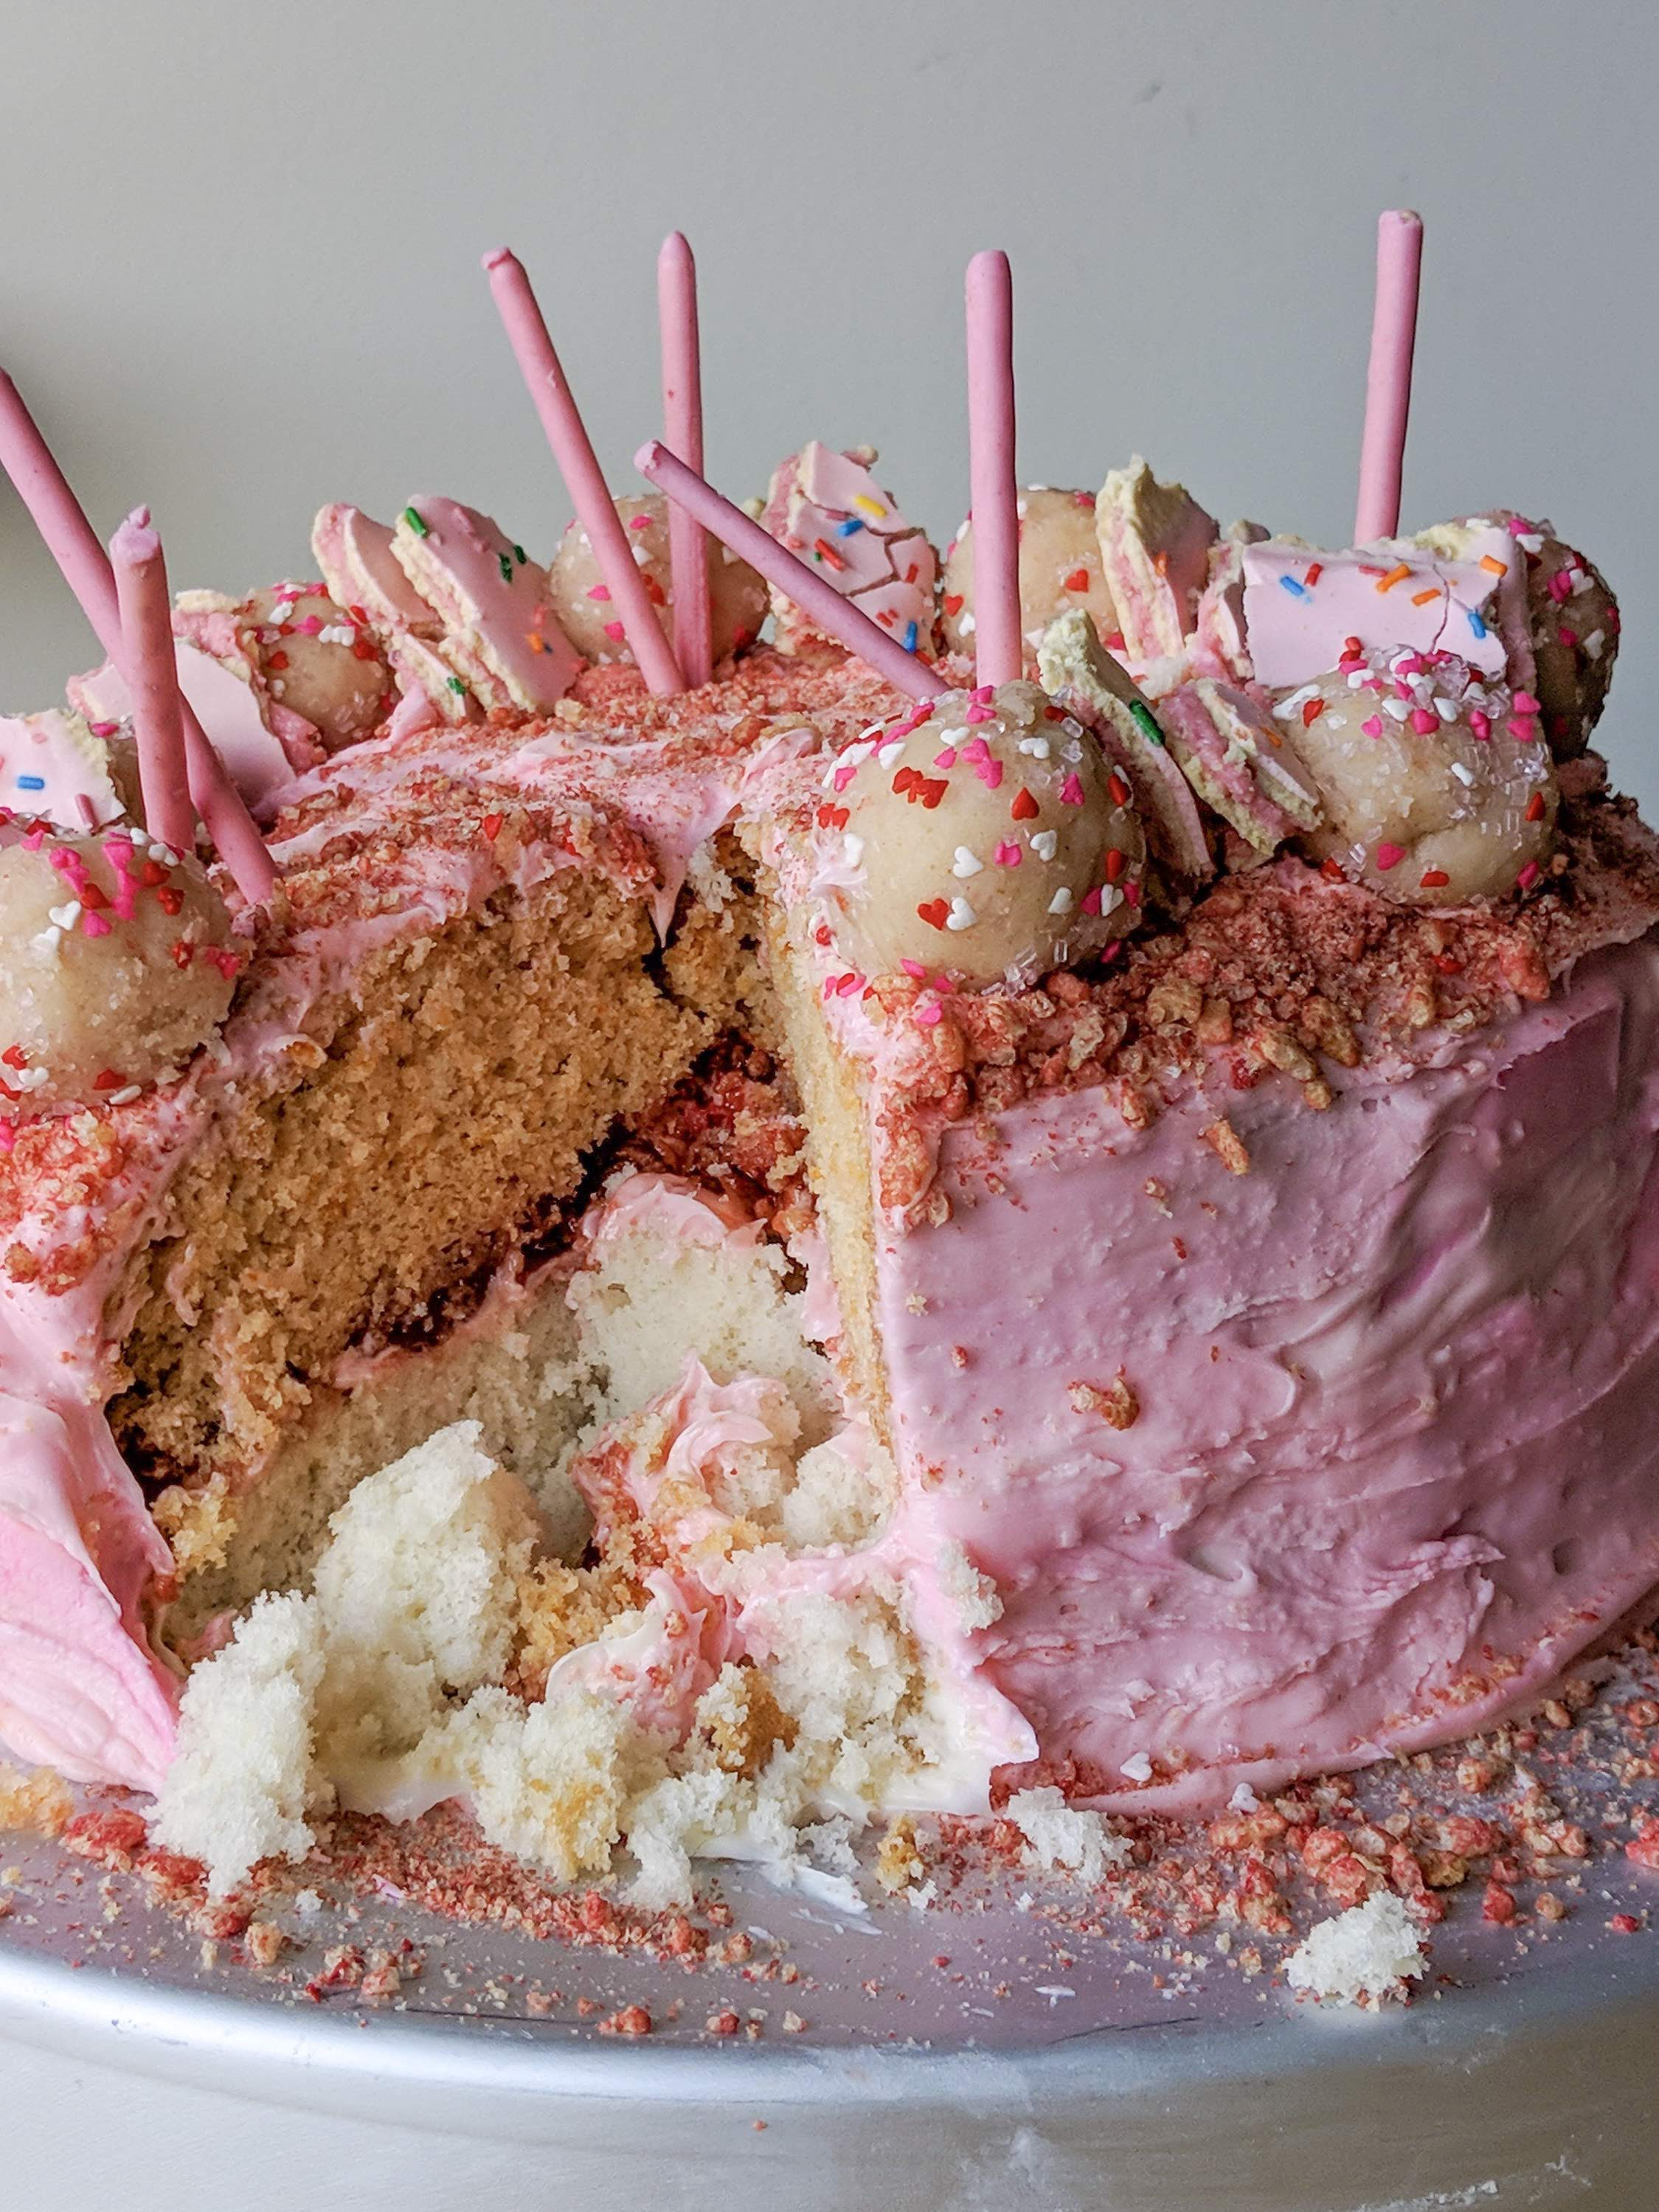 layered strawberry and vanilla cake with strawberry jam and strawberry crispy cereal, strawberry pop-tarts, cake balls and pocky sticks